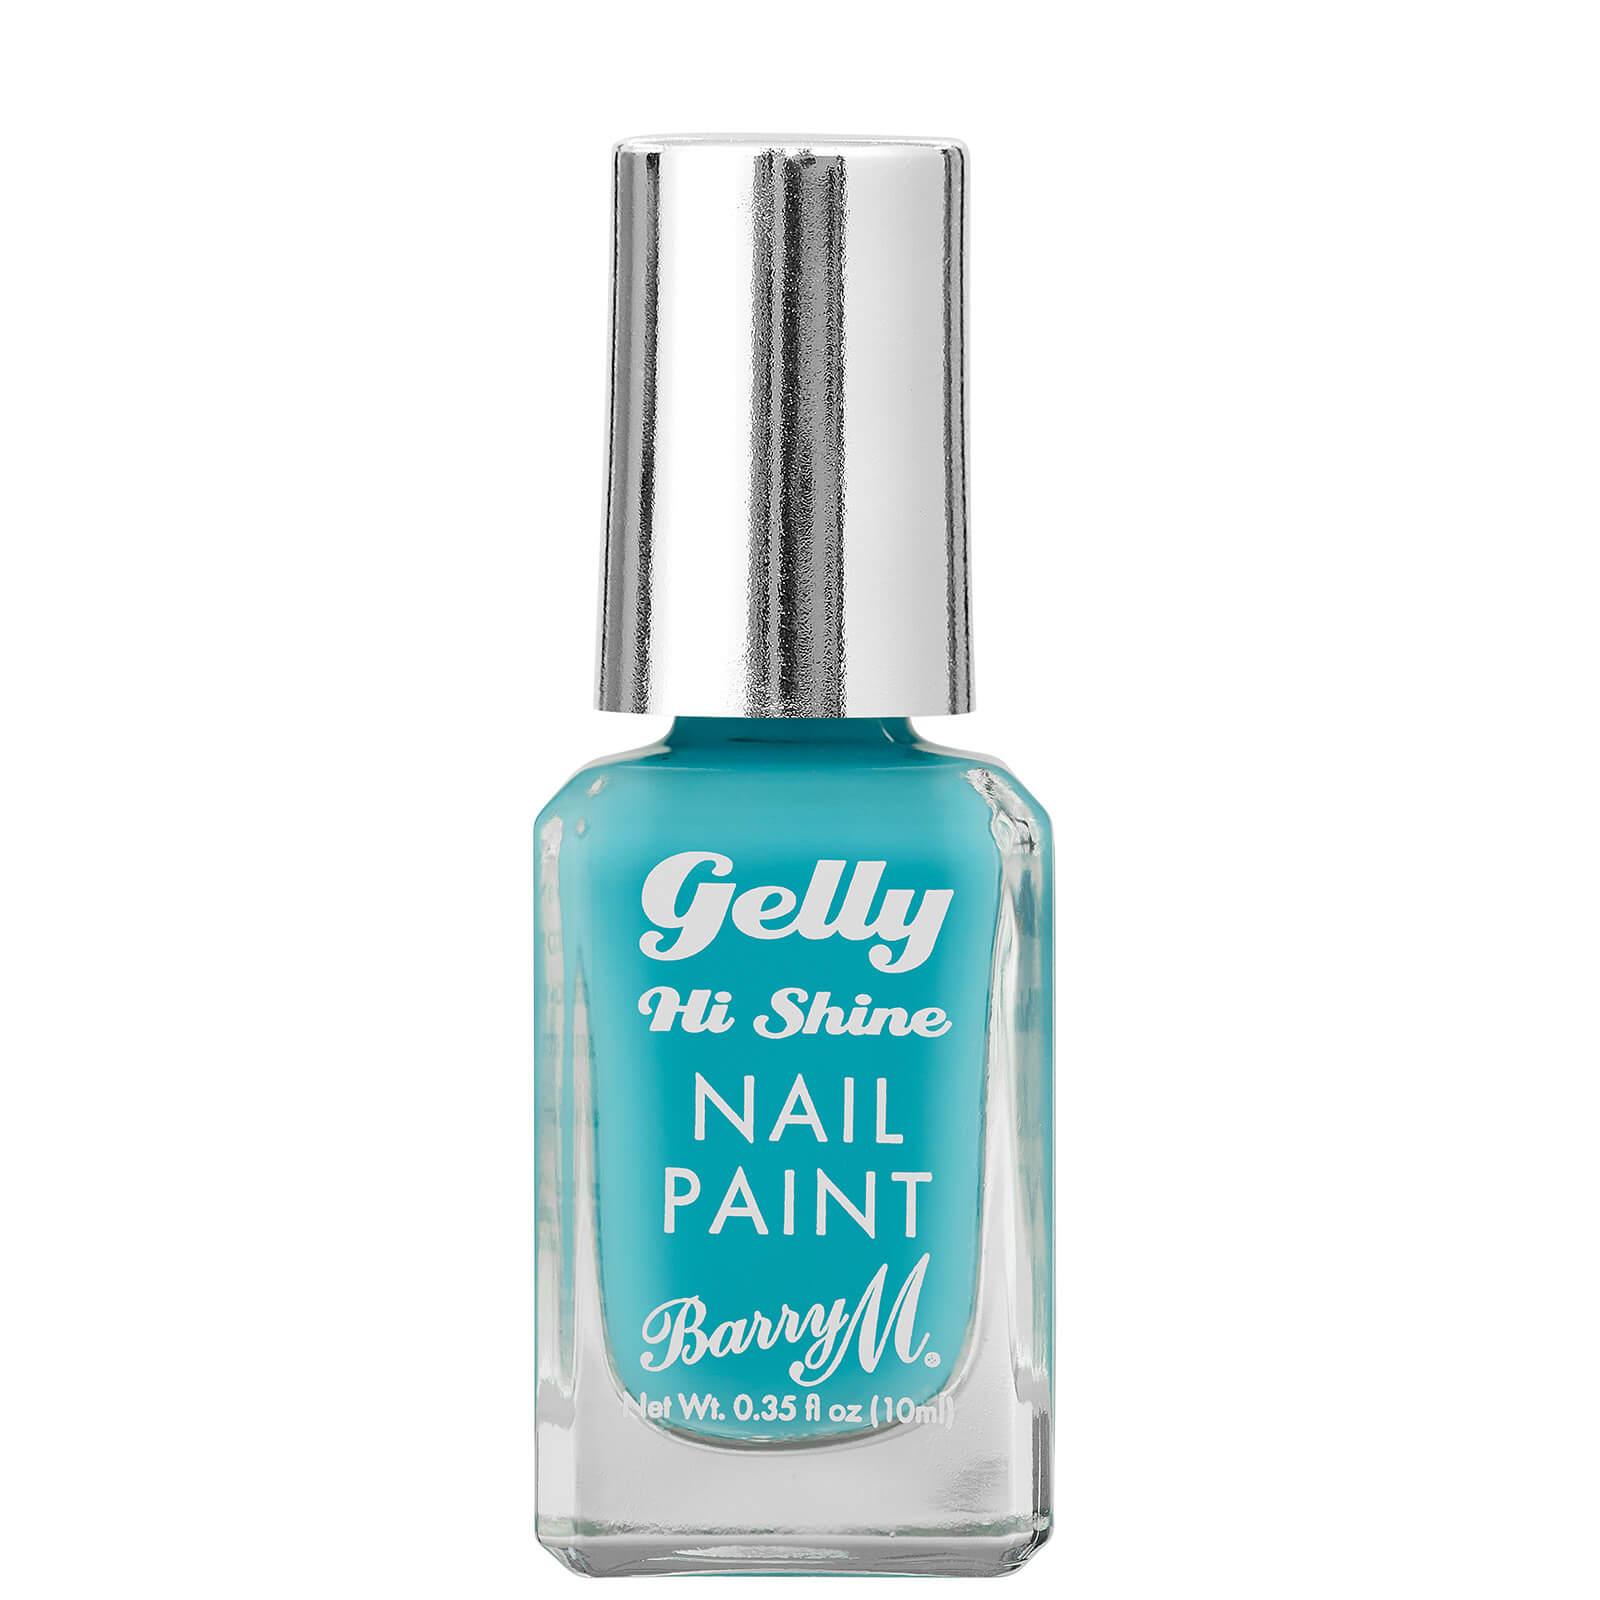 Купить Barry M Cosmetics Gelly Nail Paint 10ml (Various Shades) - Berry Pie